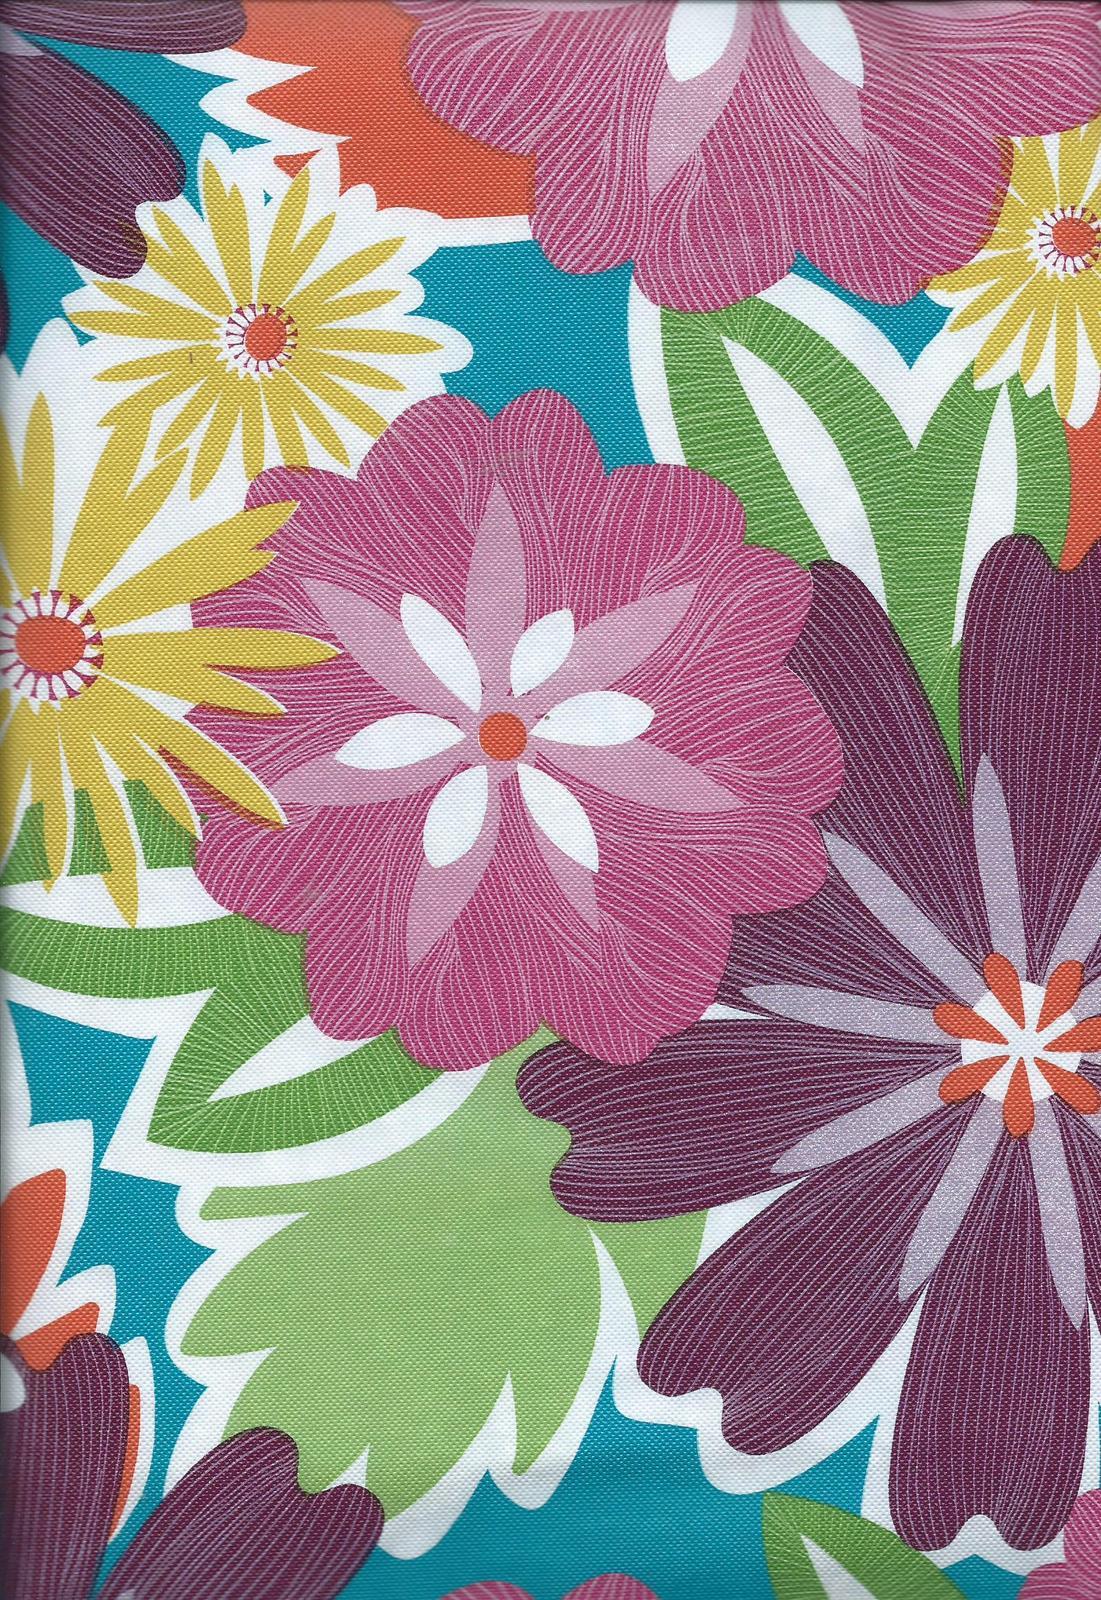 Twist Flower Purple Pink Yellow Vinyl Tablecloth Flannel Back - $10.99 - $12.99